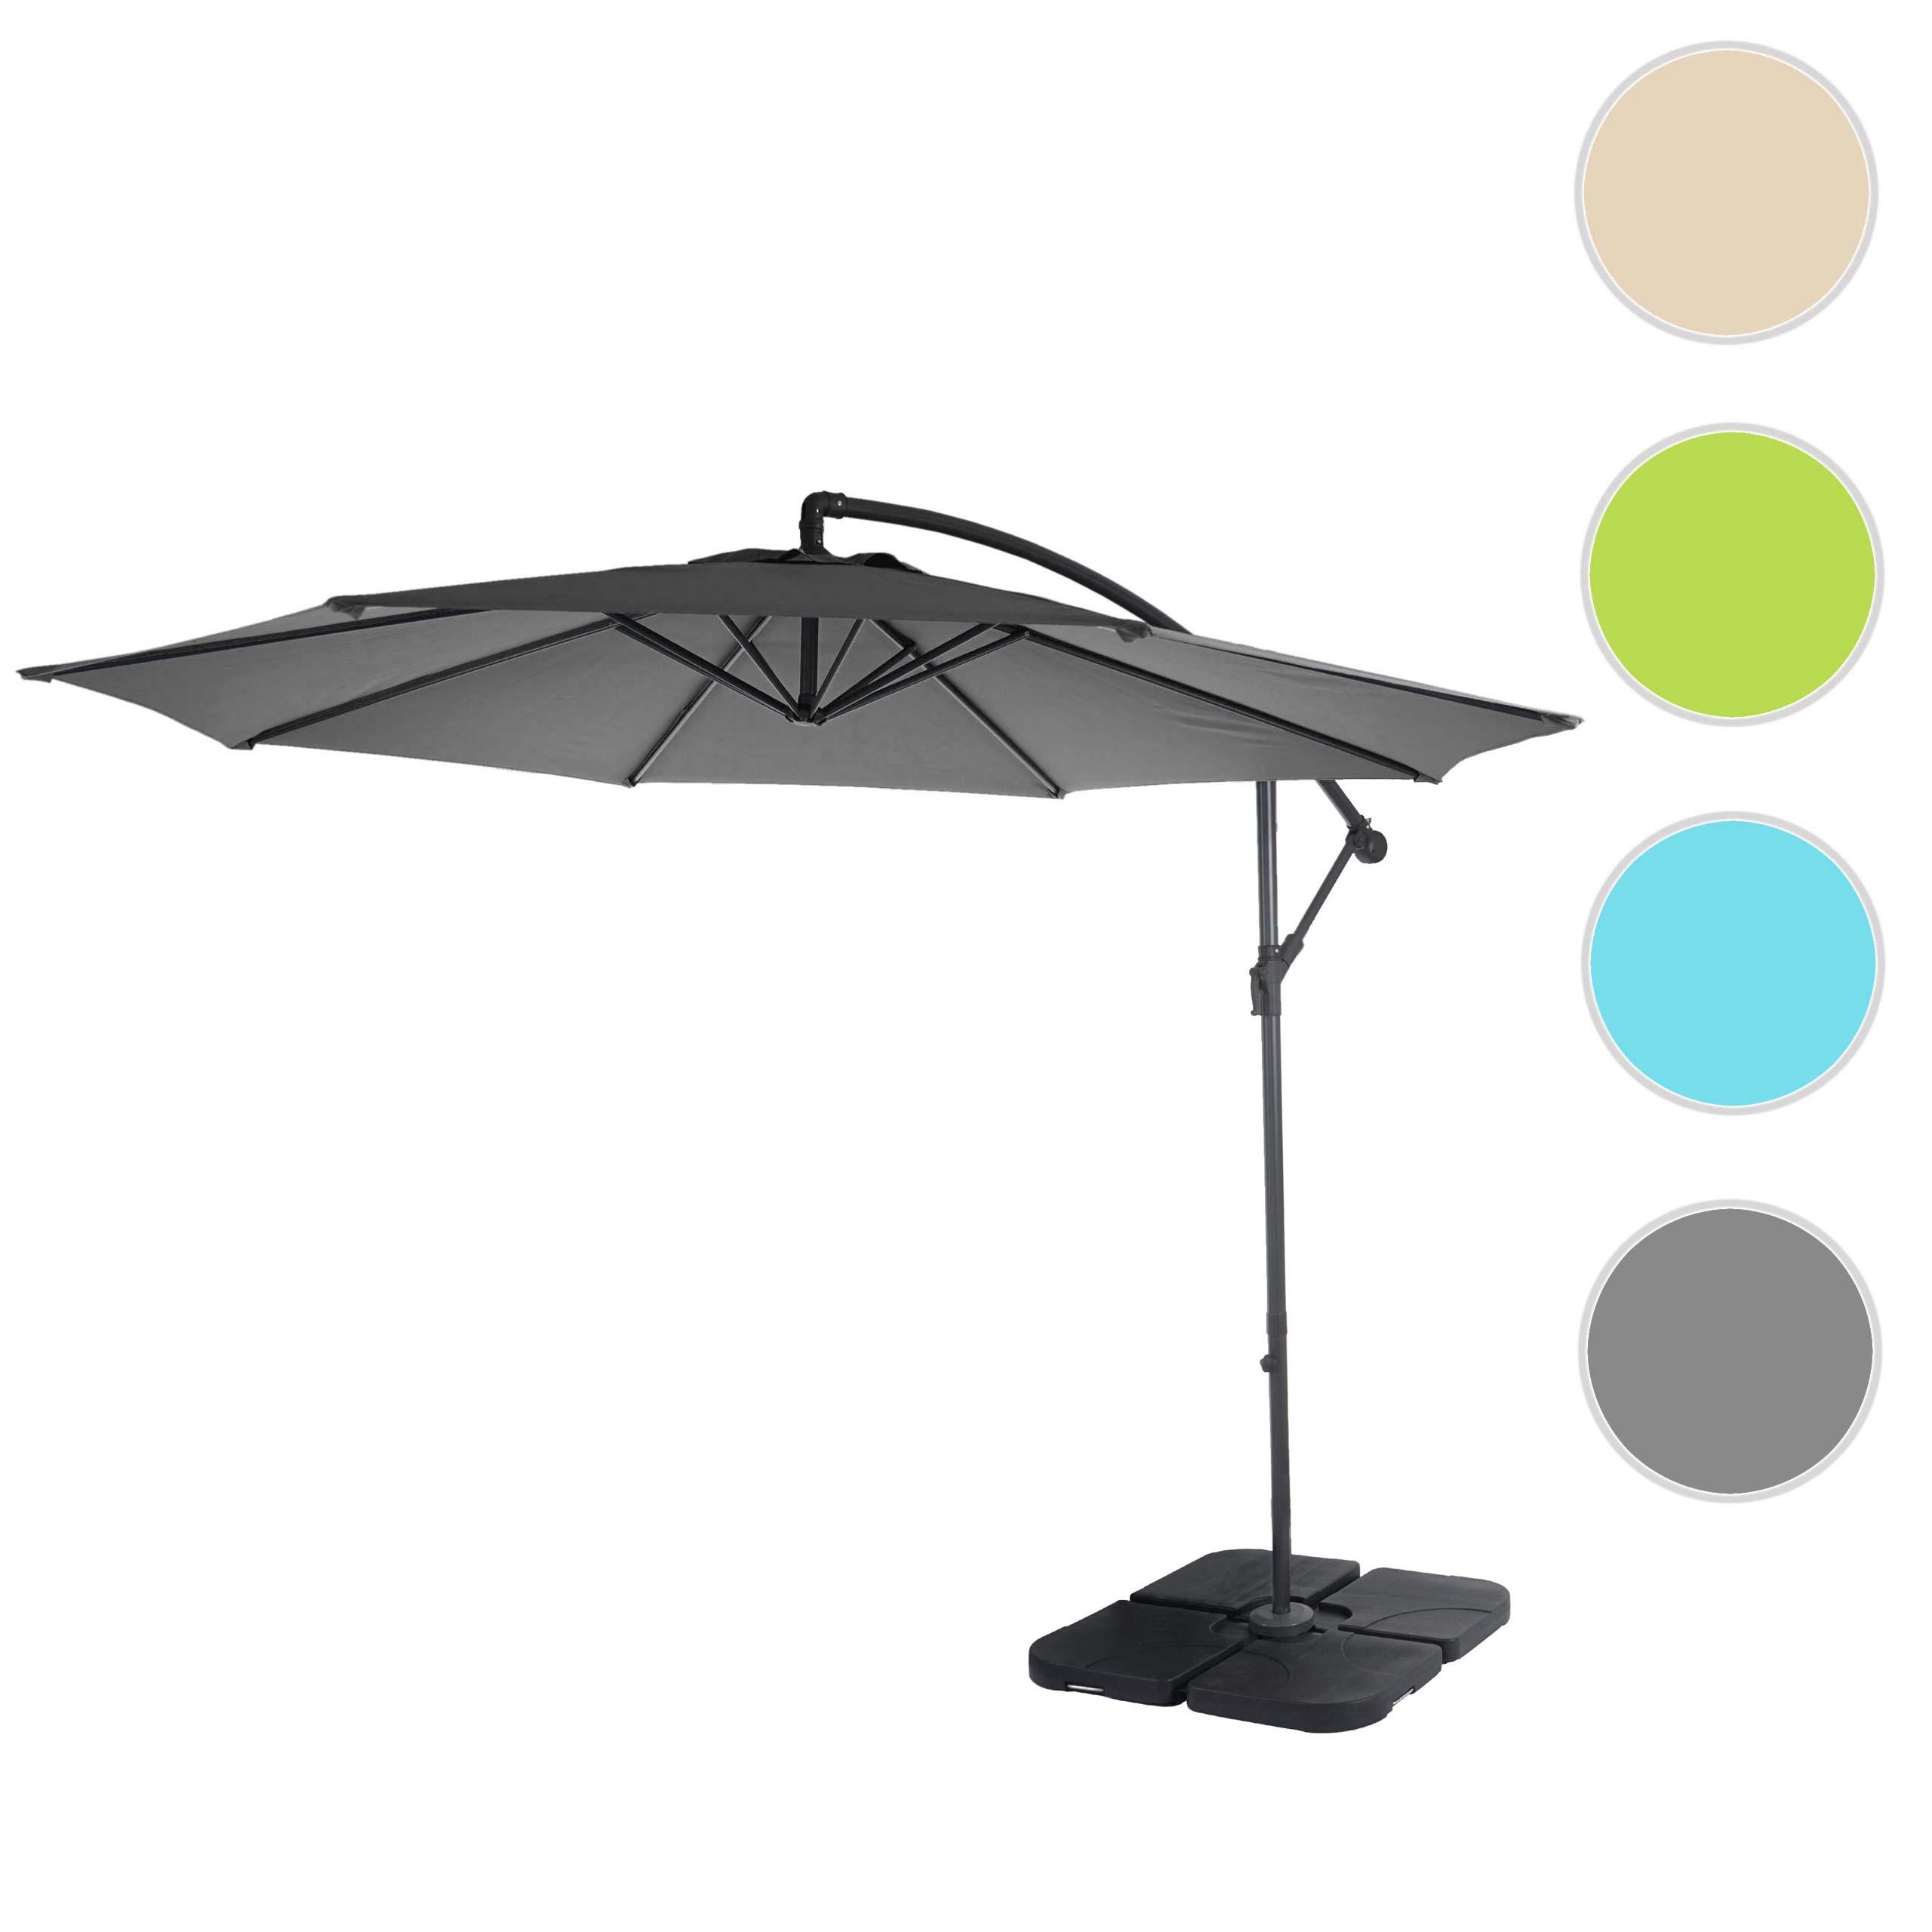 Mendler Ampelschirm Acerra, Sonnenschirm Sonnenschutz, Ř 3m neigbar, Polyester/Stahl 11kg ~ Variantenangebot 46812+31831